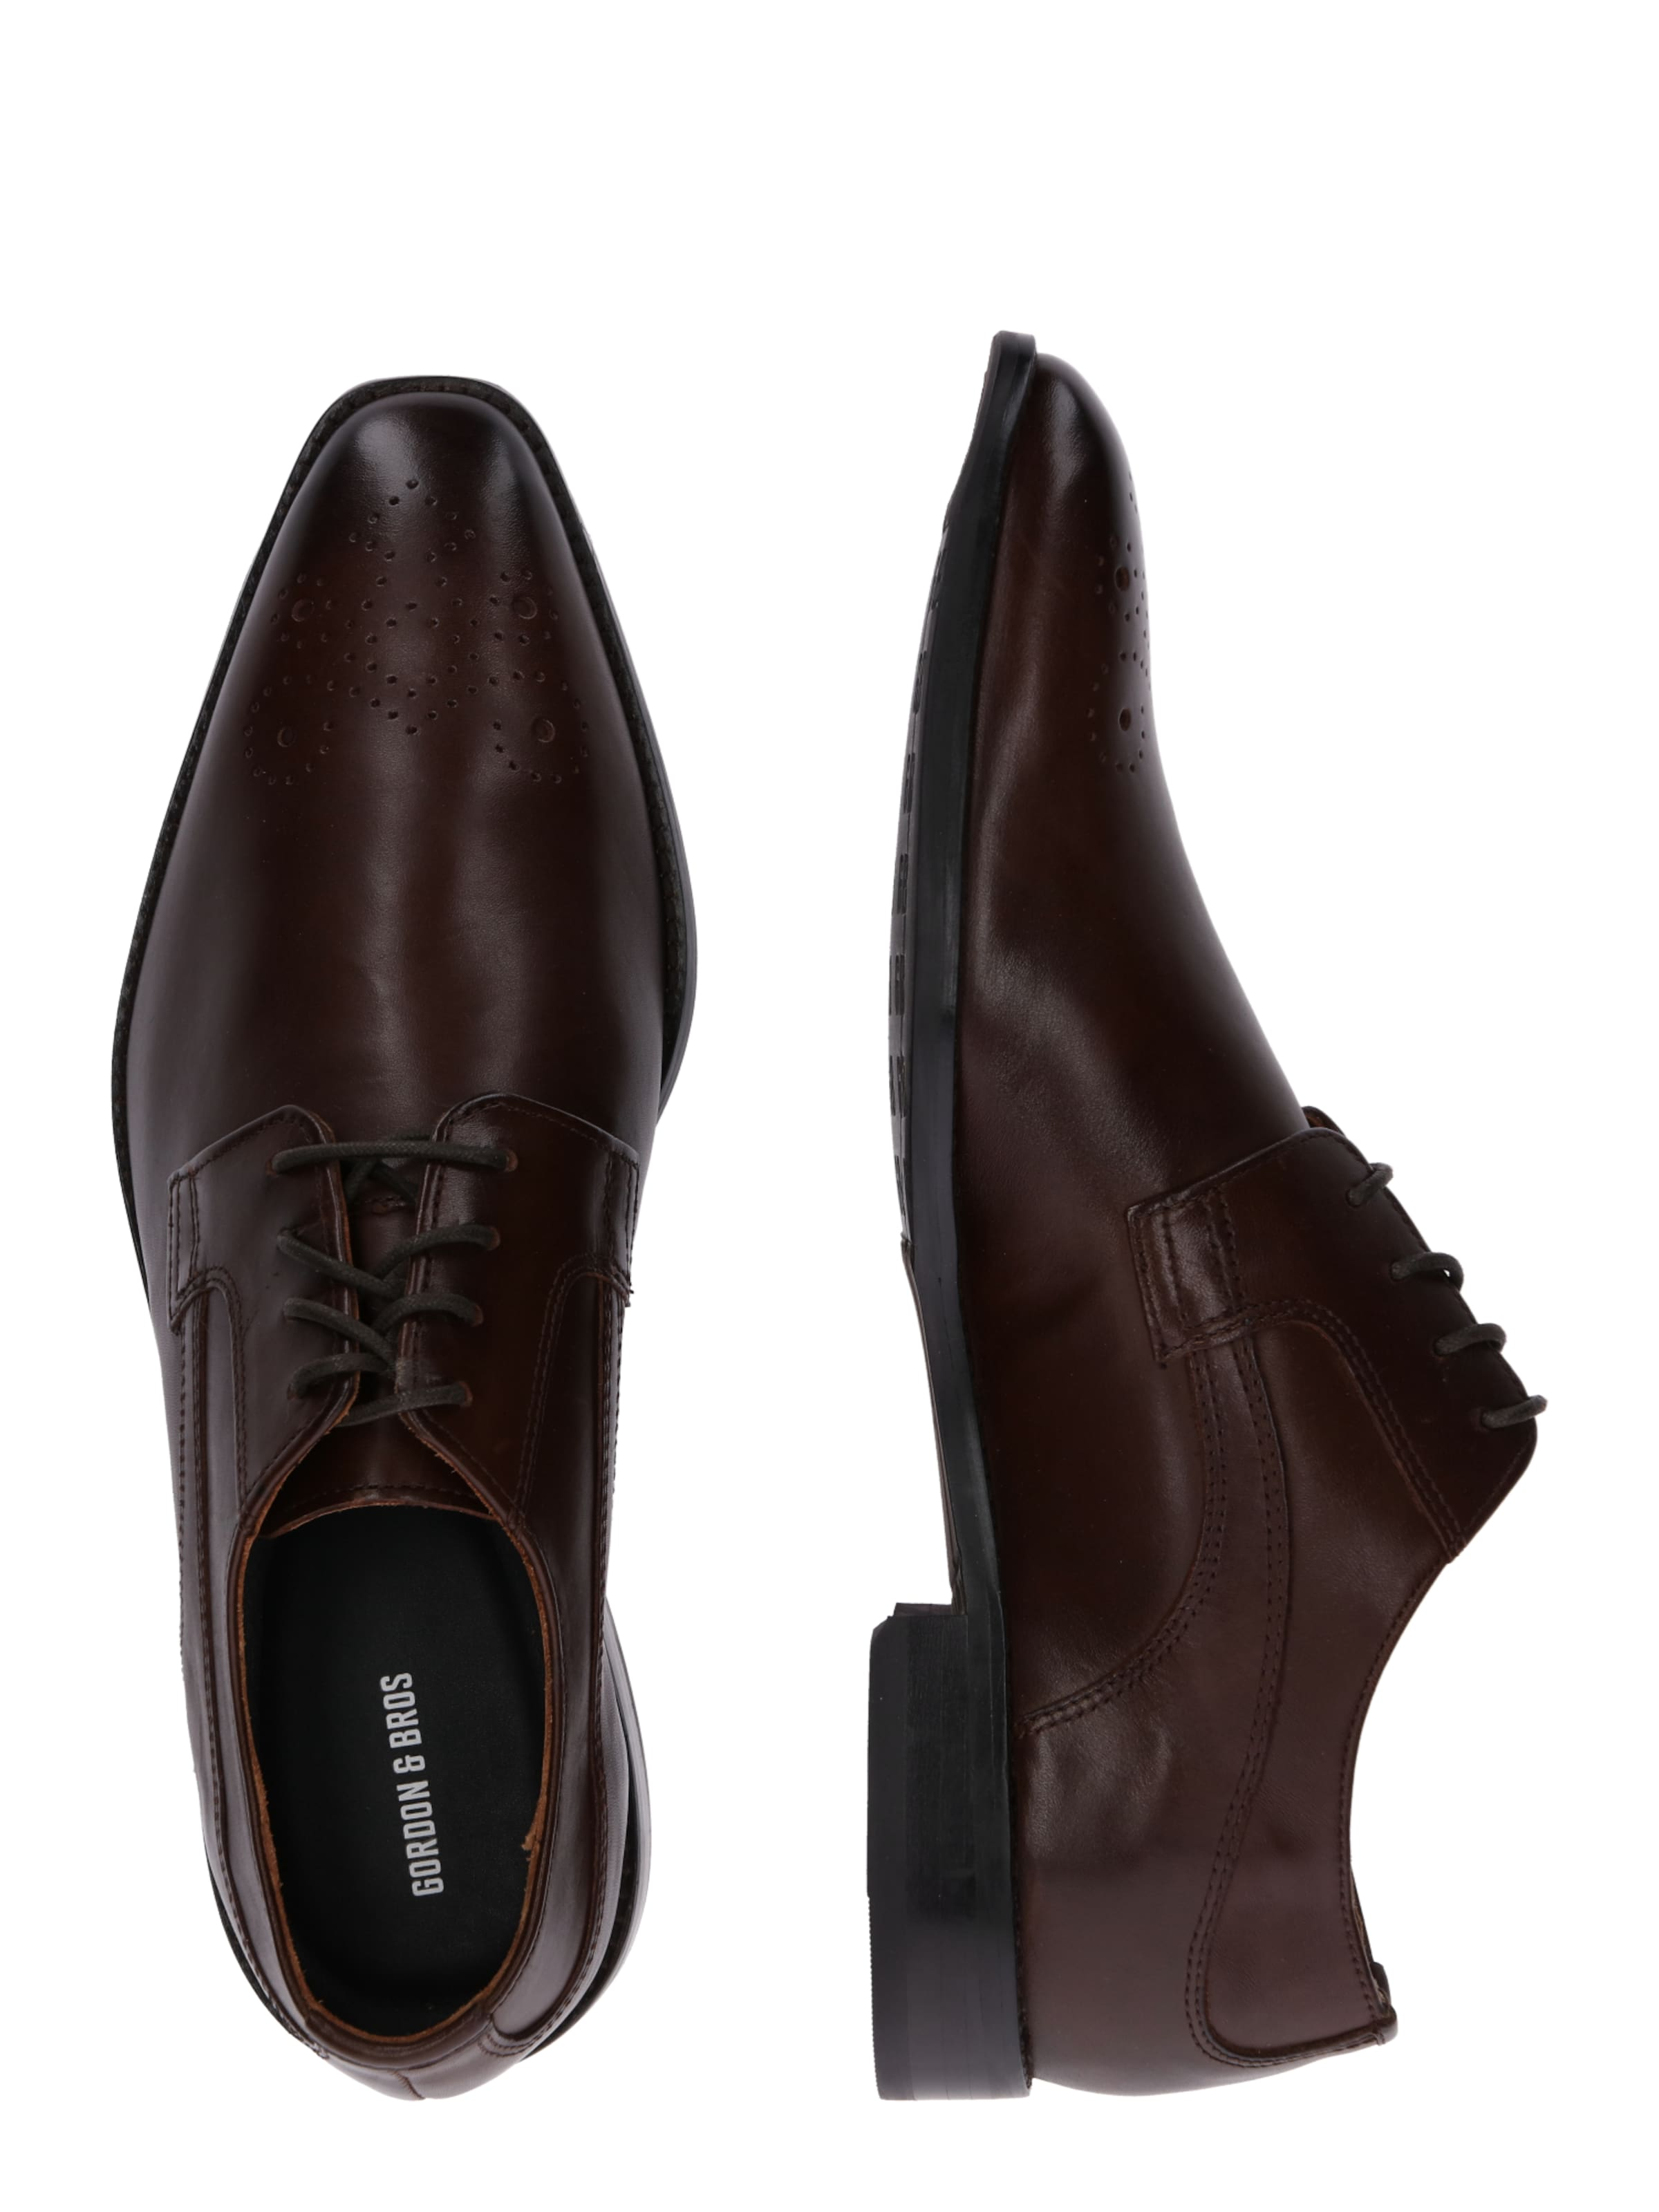 À Brun En Lacets Bros 'lorenzo' Foncé Chaussure Gordonamp; ONw0vym8n